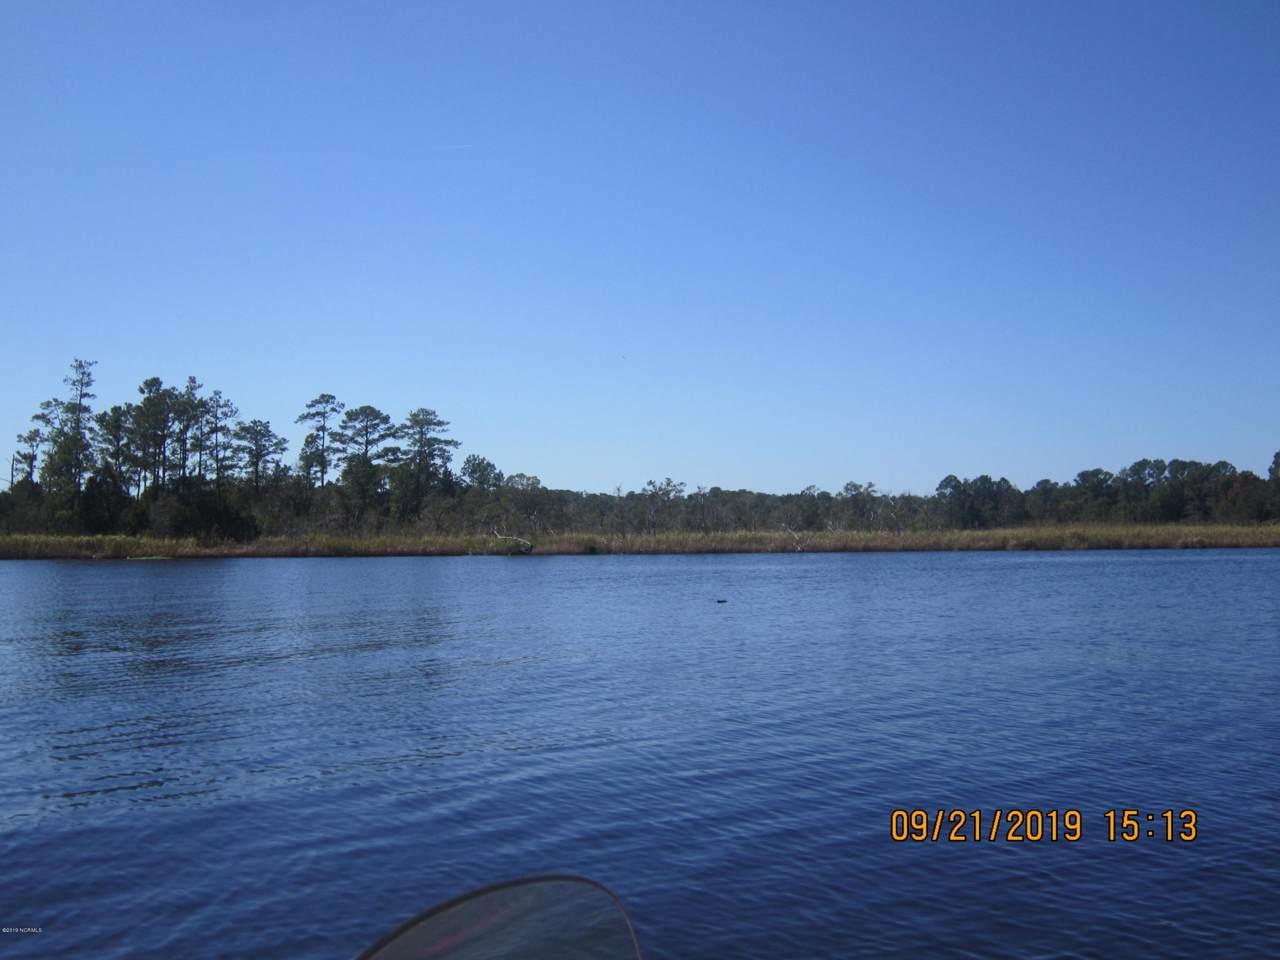 000 Collins Island Aka Goat Island - Photo 1